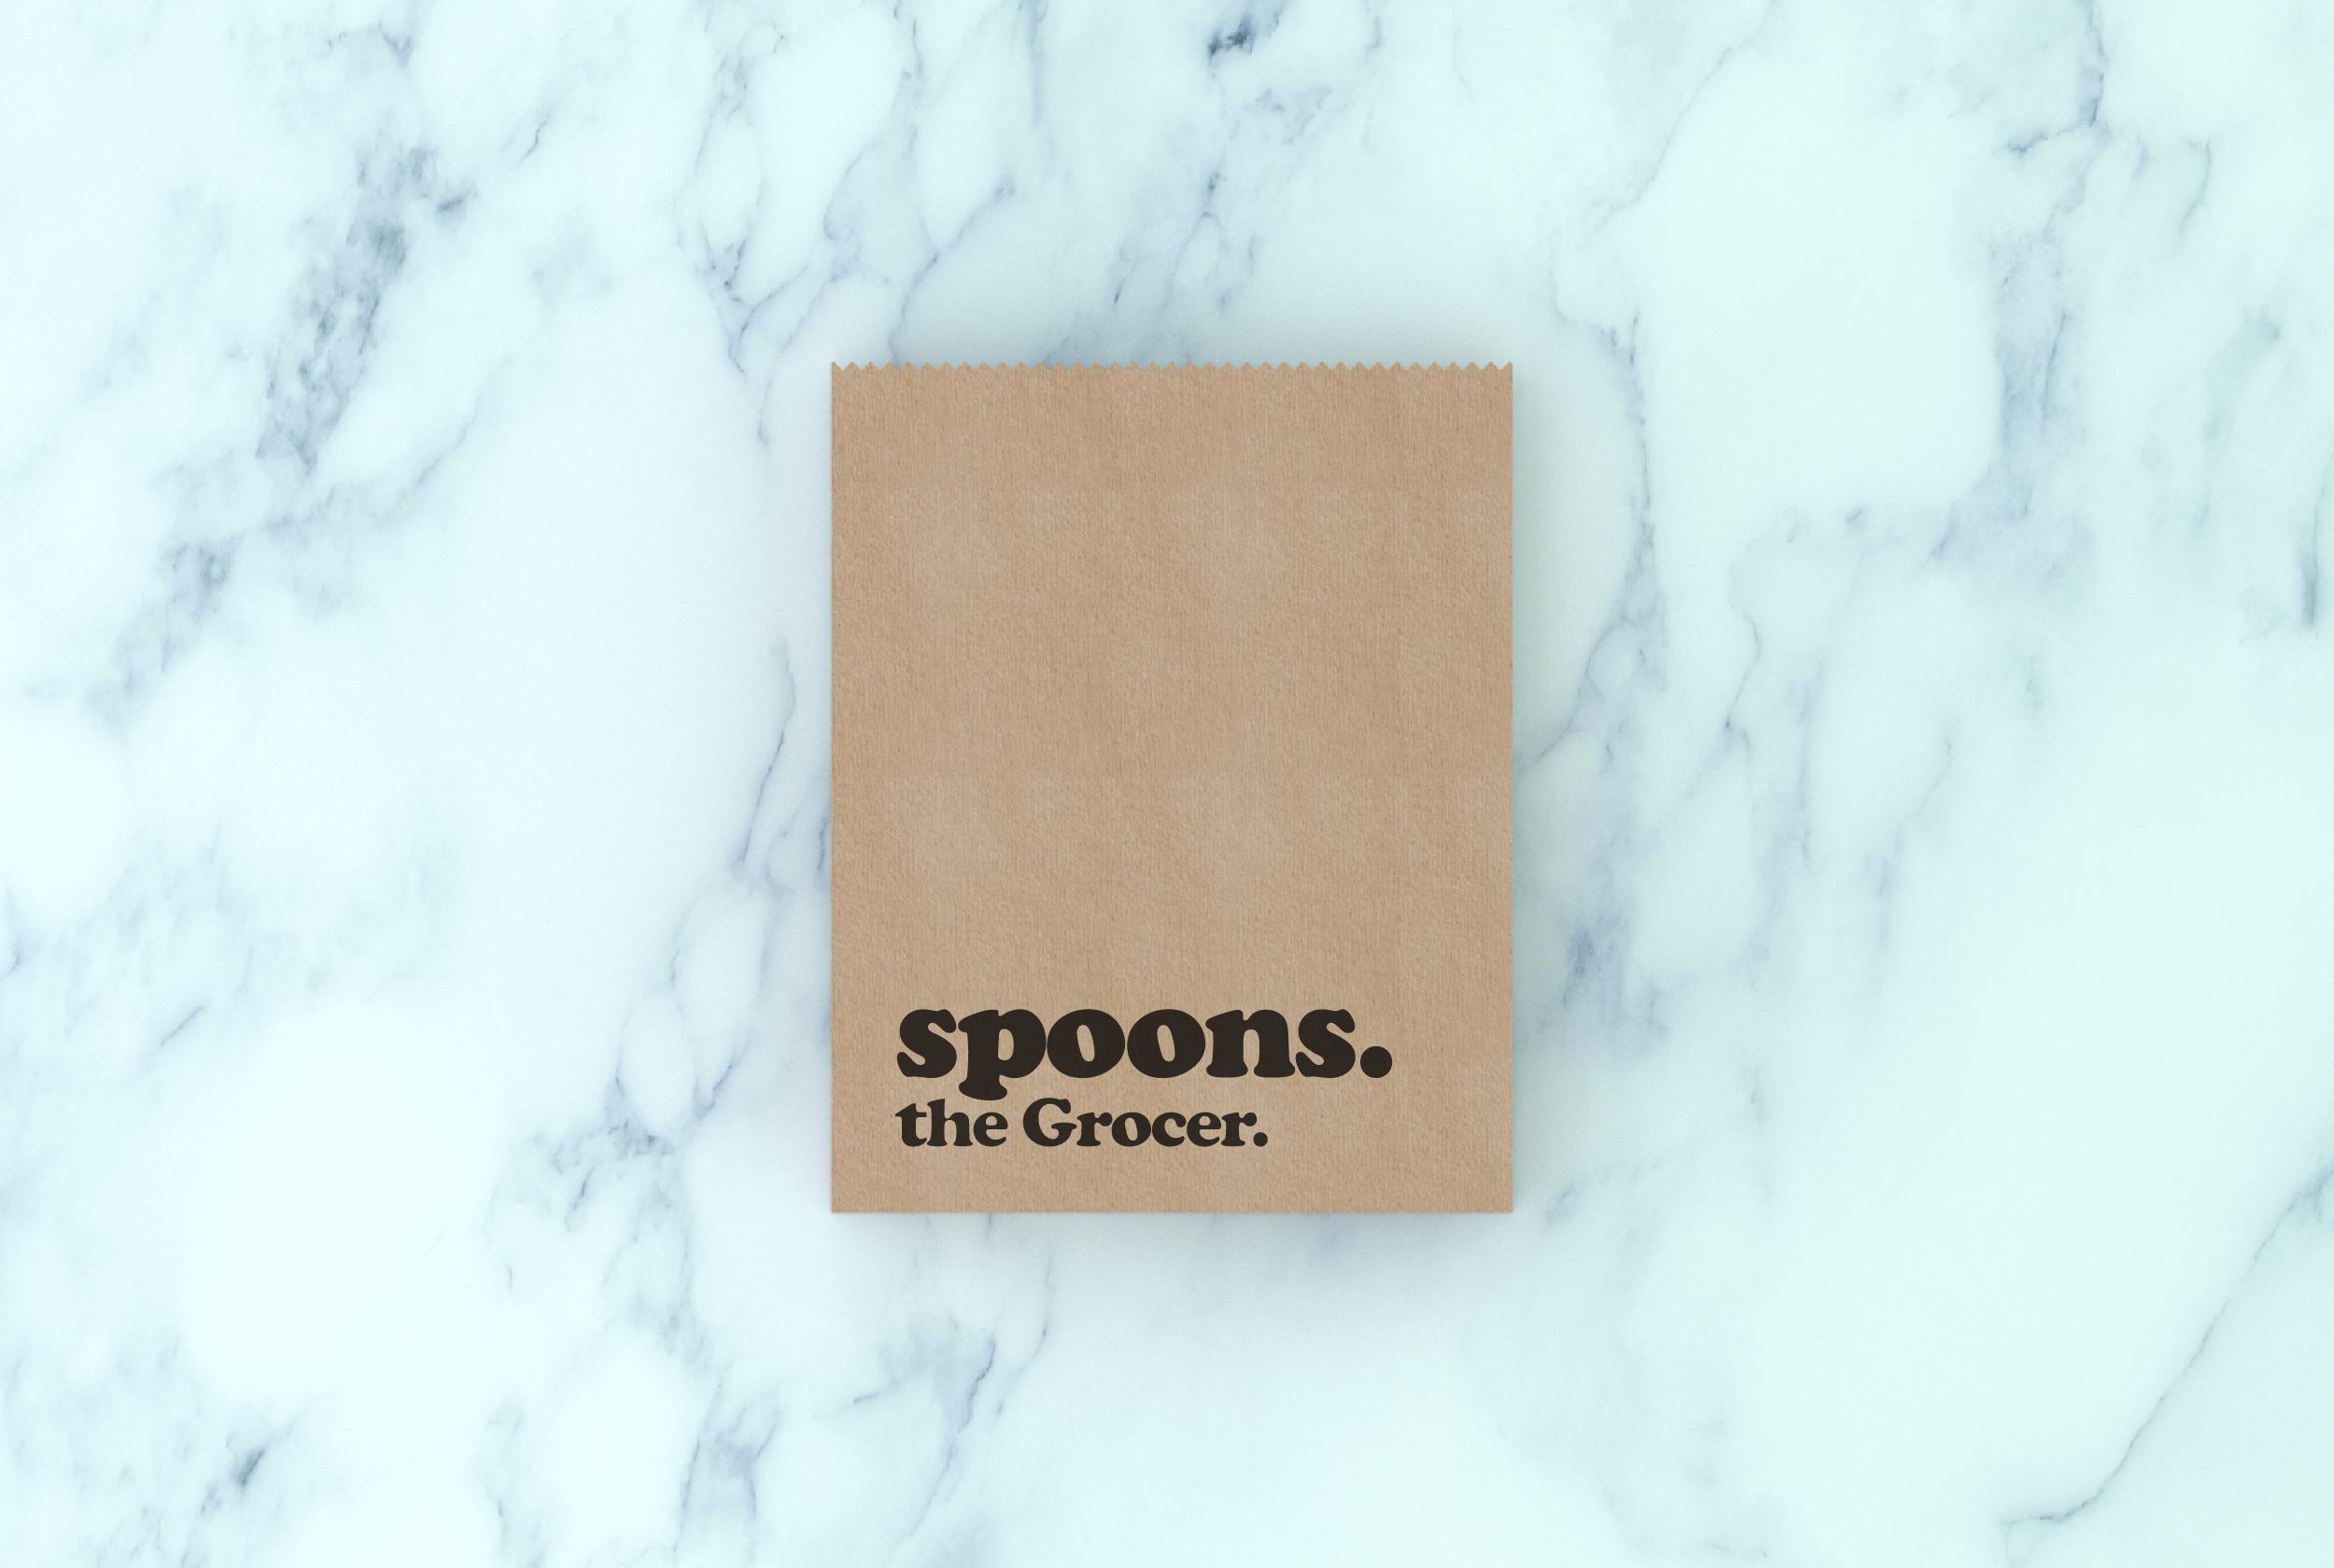 spoons-the-grocer-paper-bag-mockup-sam-blomley-branding